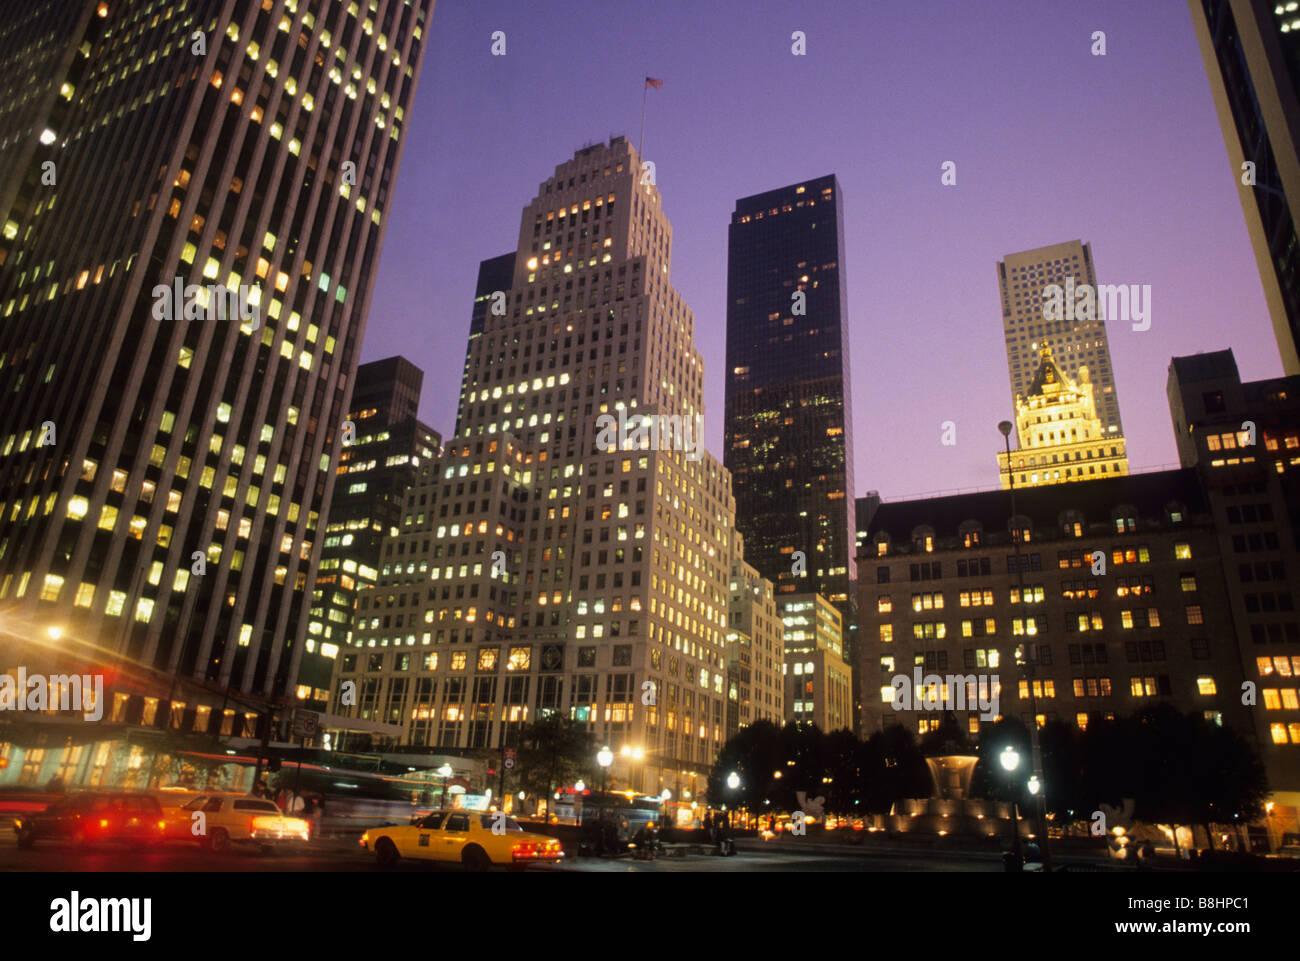 New York City Fifth Avenue Skyline Midtown Manhattan at Dusk USA - Stock Image